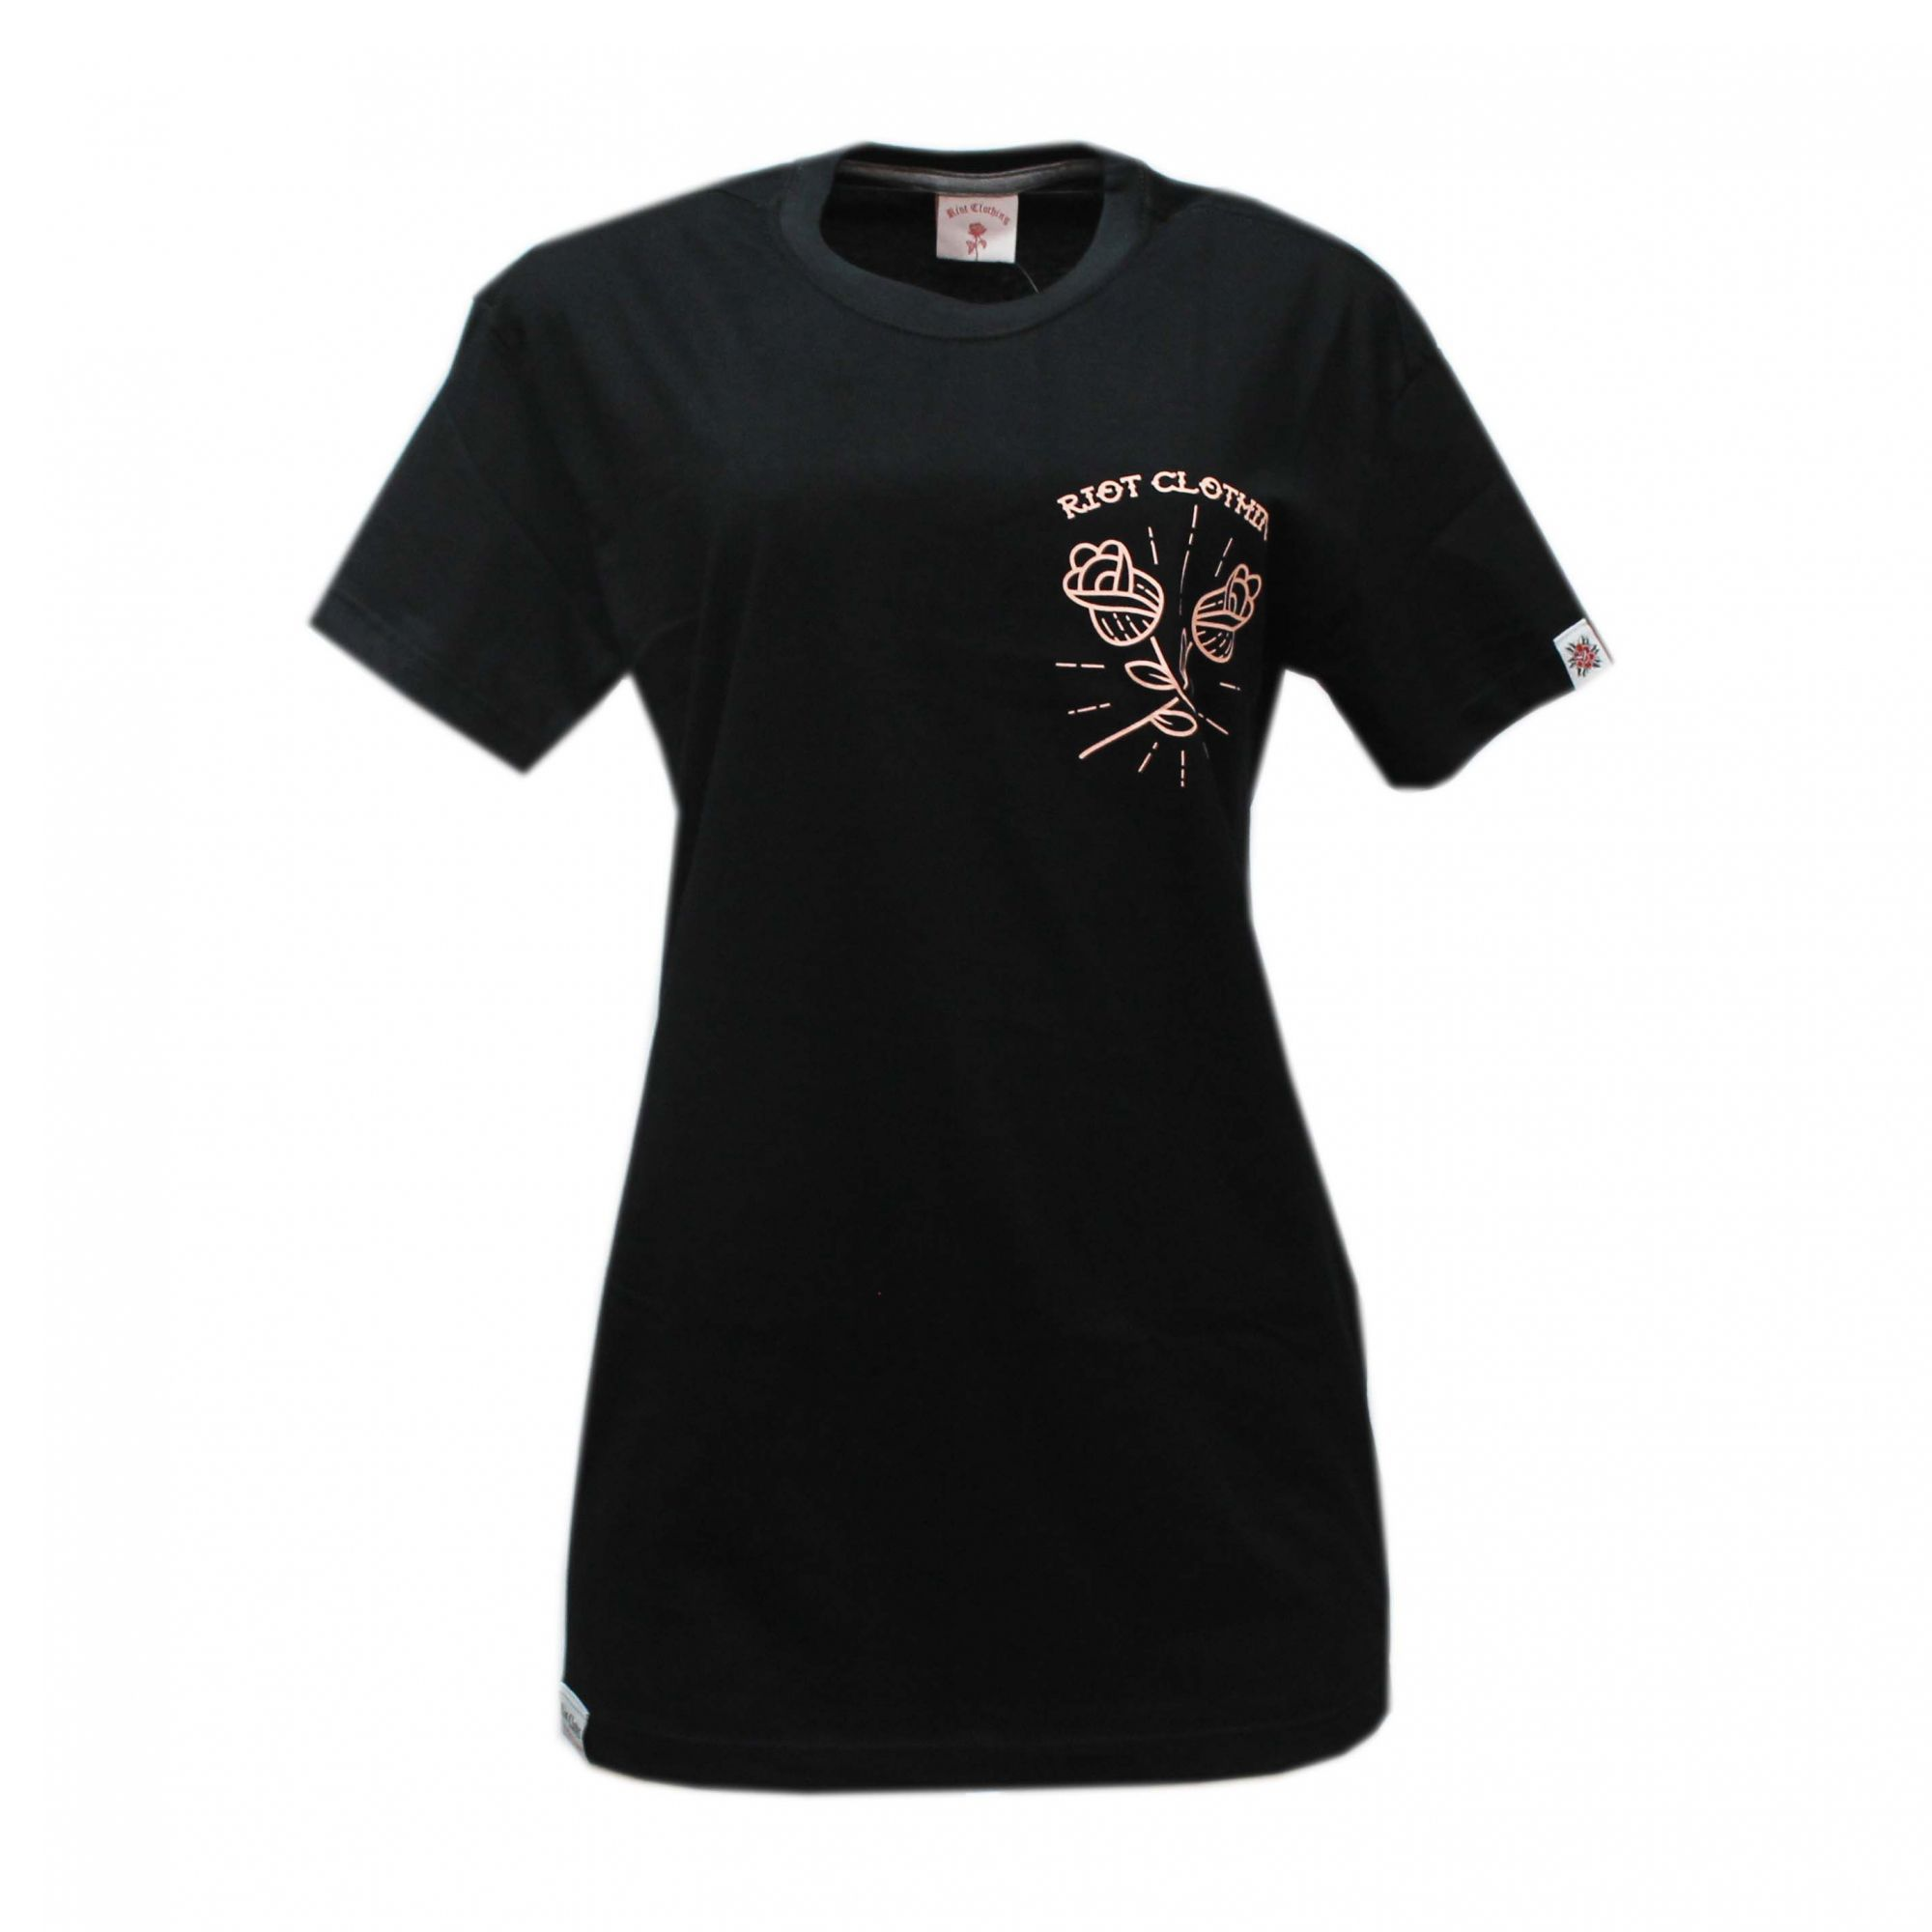 Camiseta Riot 2Love Preto